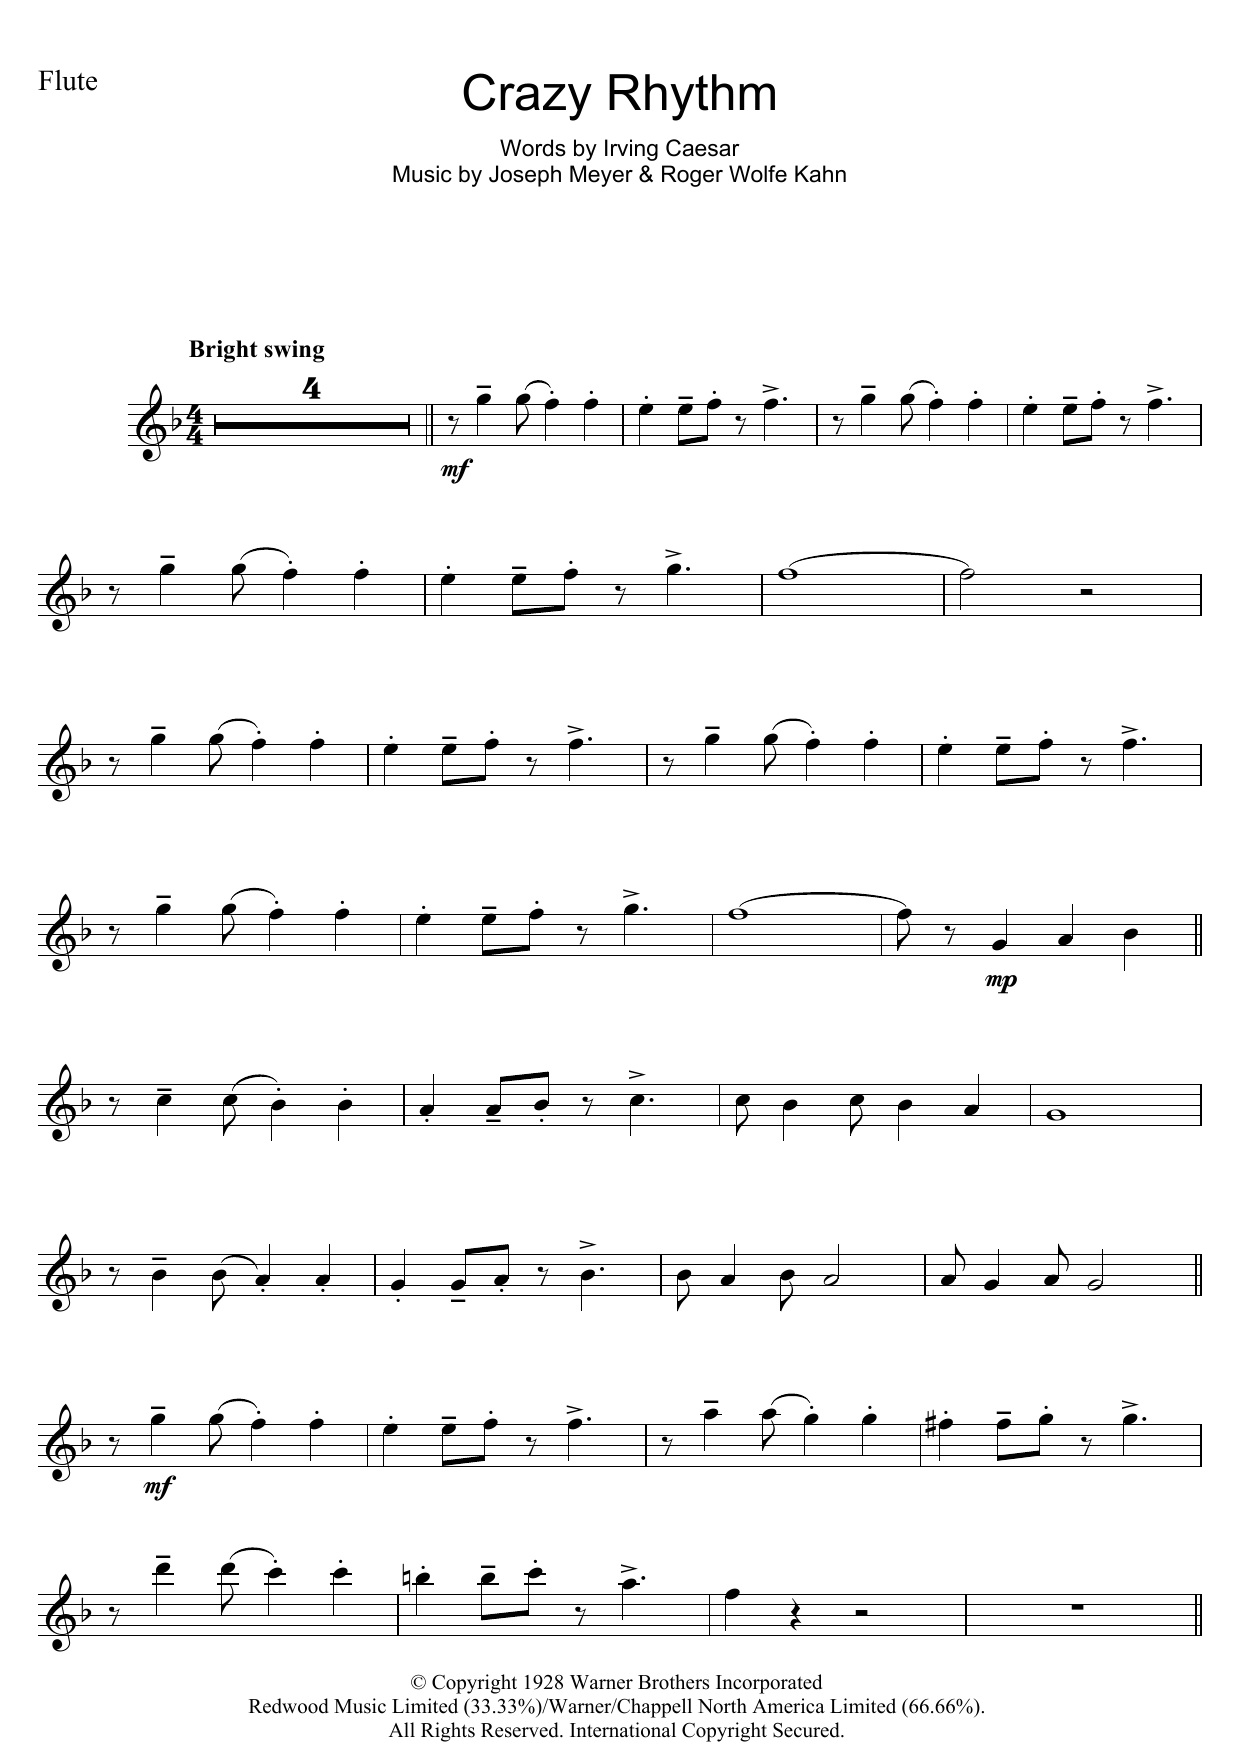 Crazy Rhythm Sheet Music